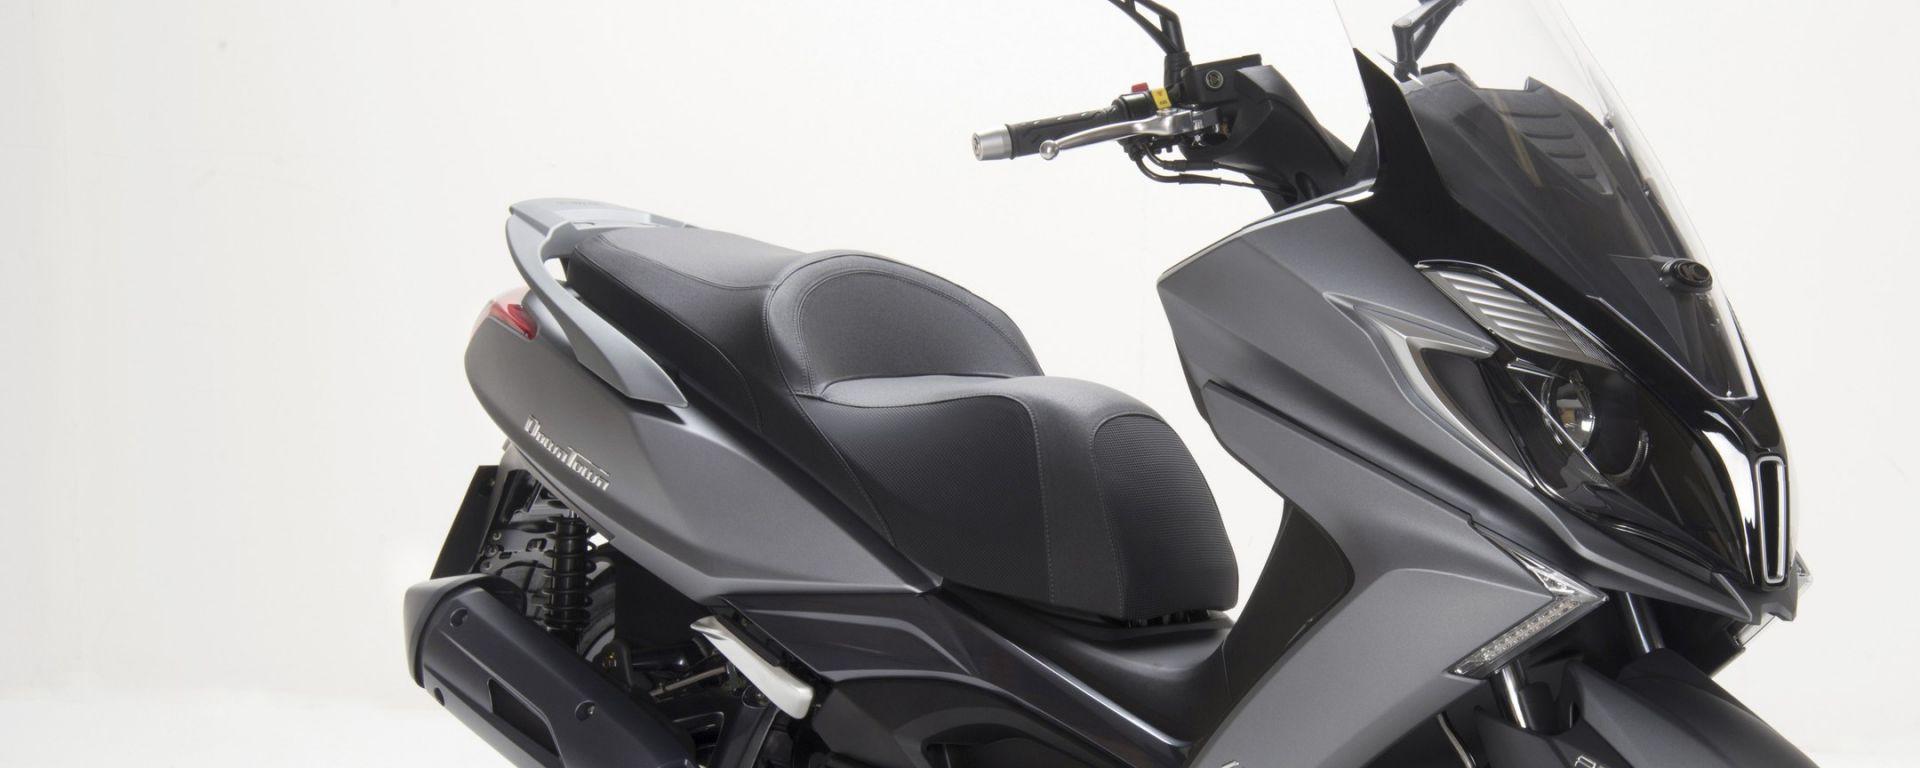 novit scooter kymco downtown 125 motorbox. Black Bedroom Furniture Sets. Home Design Ideas